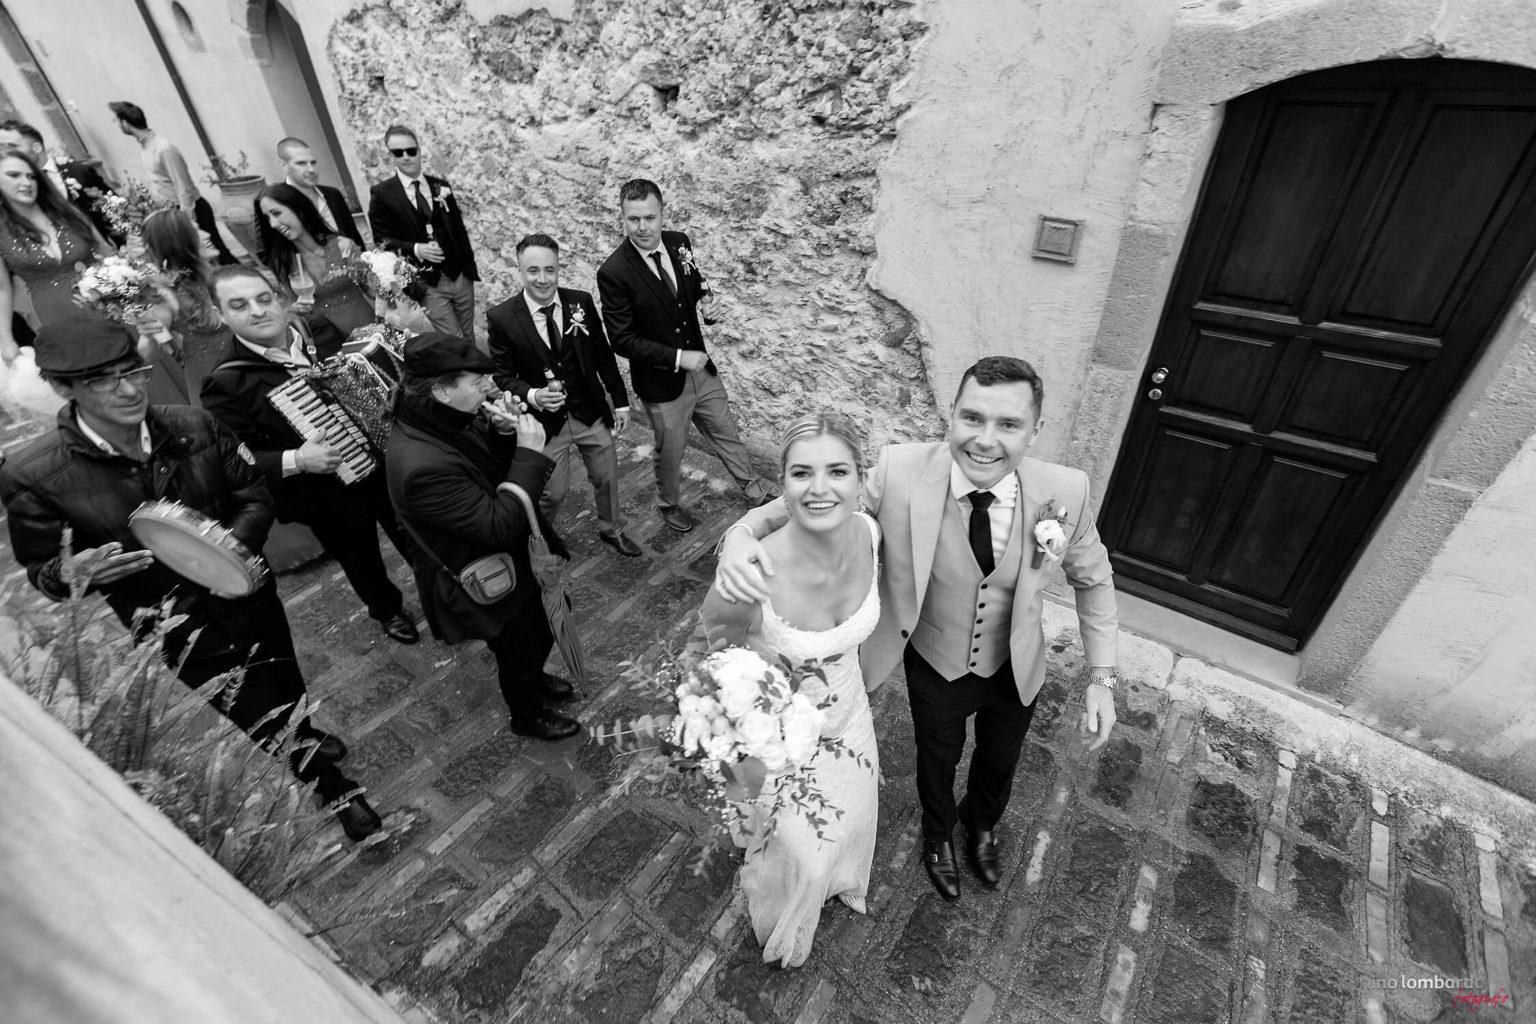 Irish wedding reportage at Savoca photographed in Borgo San Rocco by Nino Lombardo